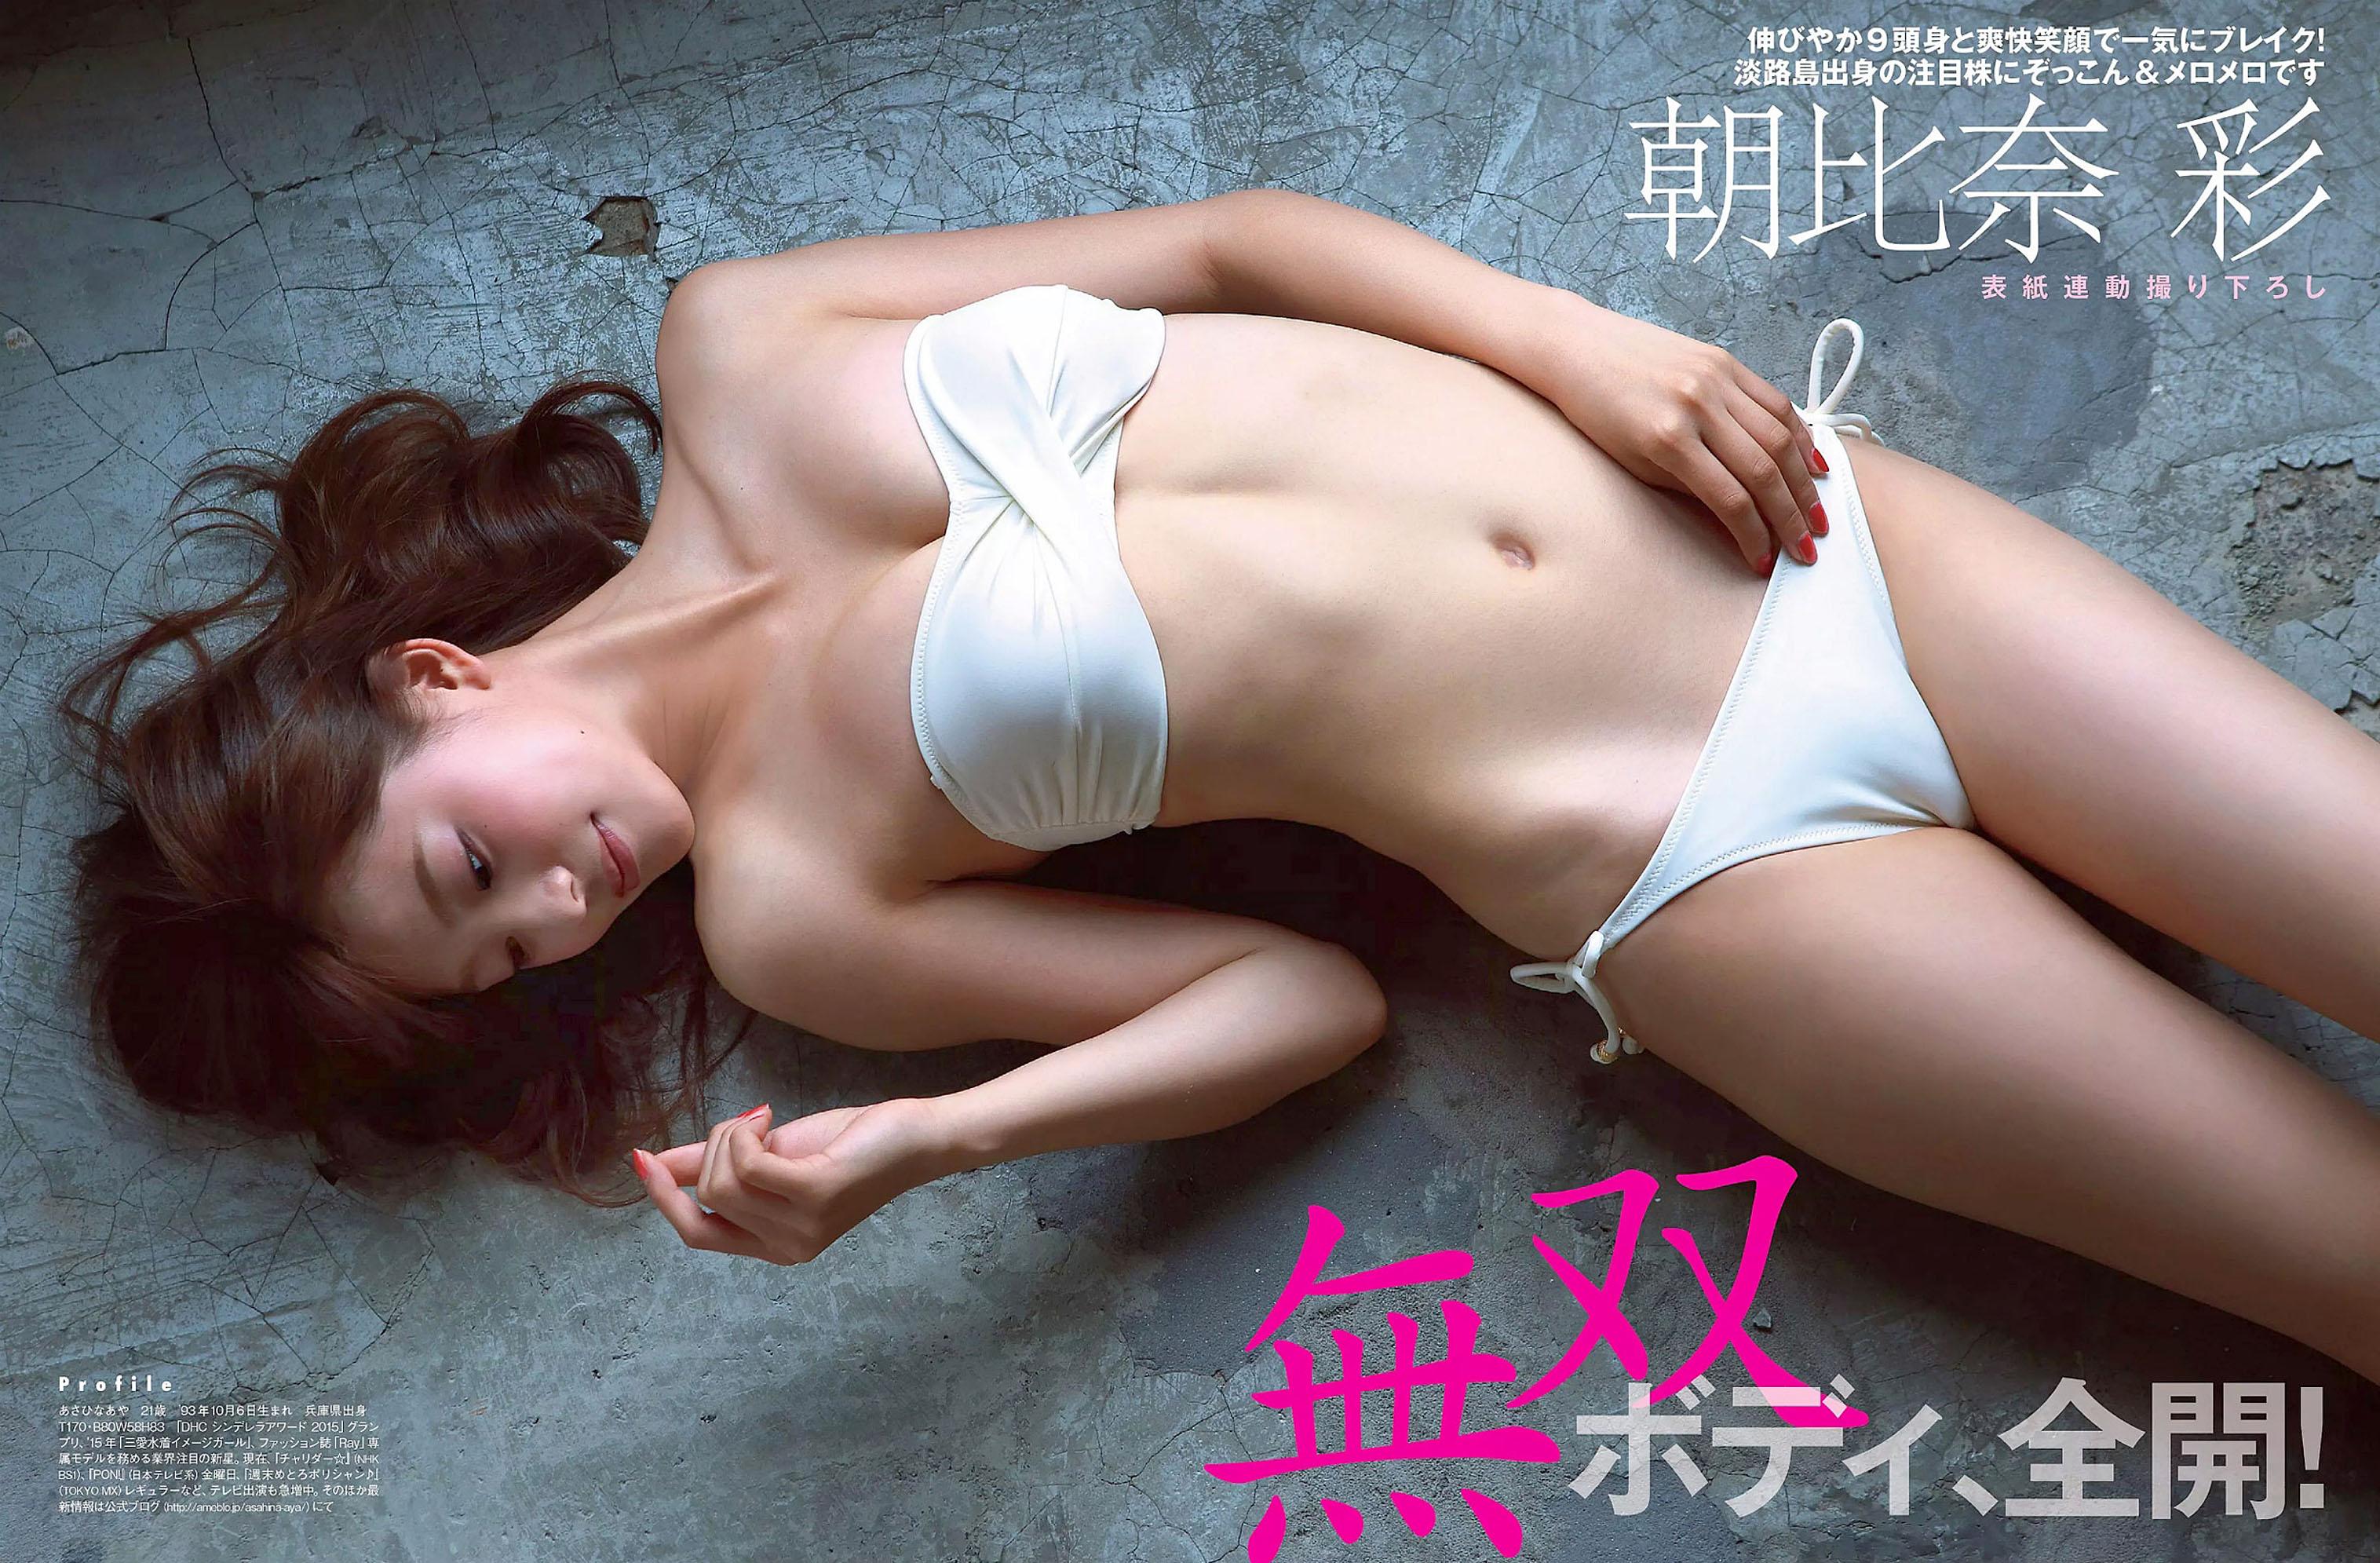 Aya Asahina Flash 150609 02.jpg